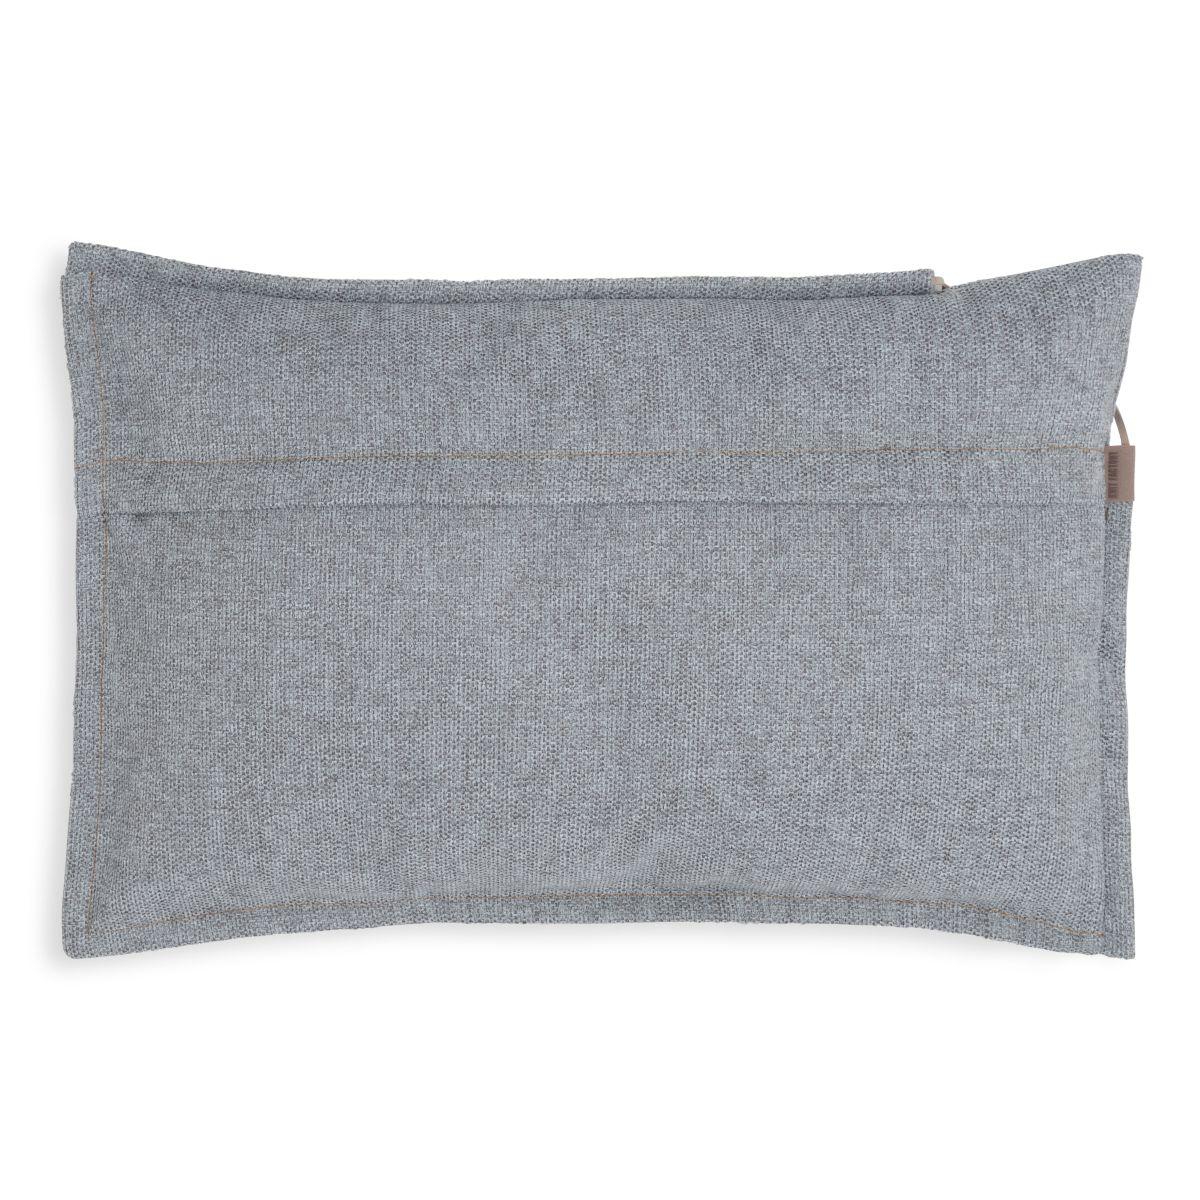 imre cushion light grey 60x40